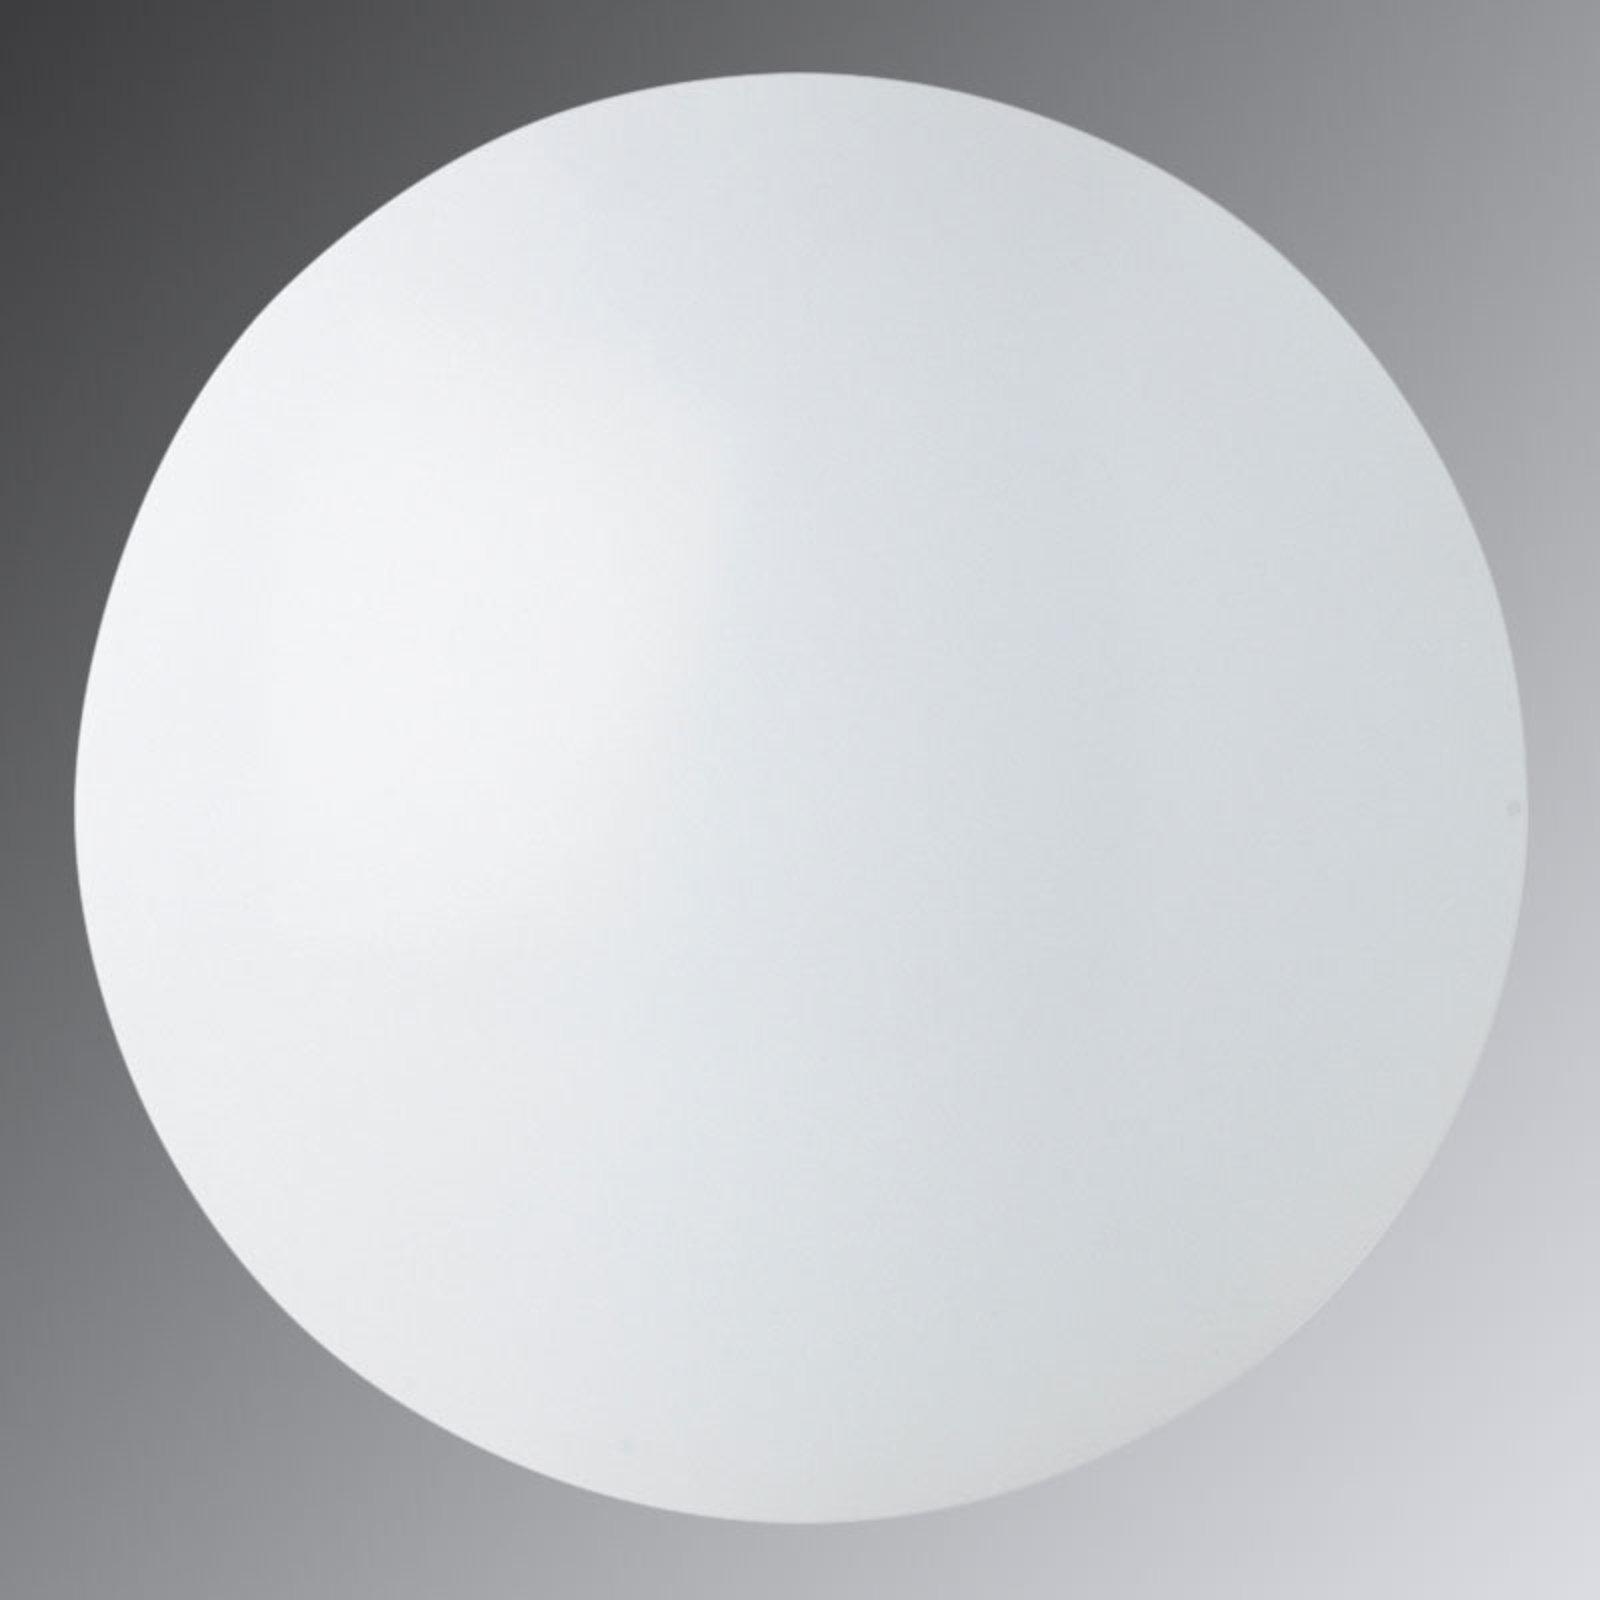 Renzo skiftesikker LED-taklampe, 22 W, 4 000 K